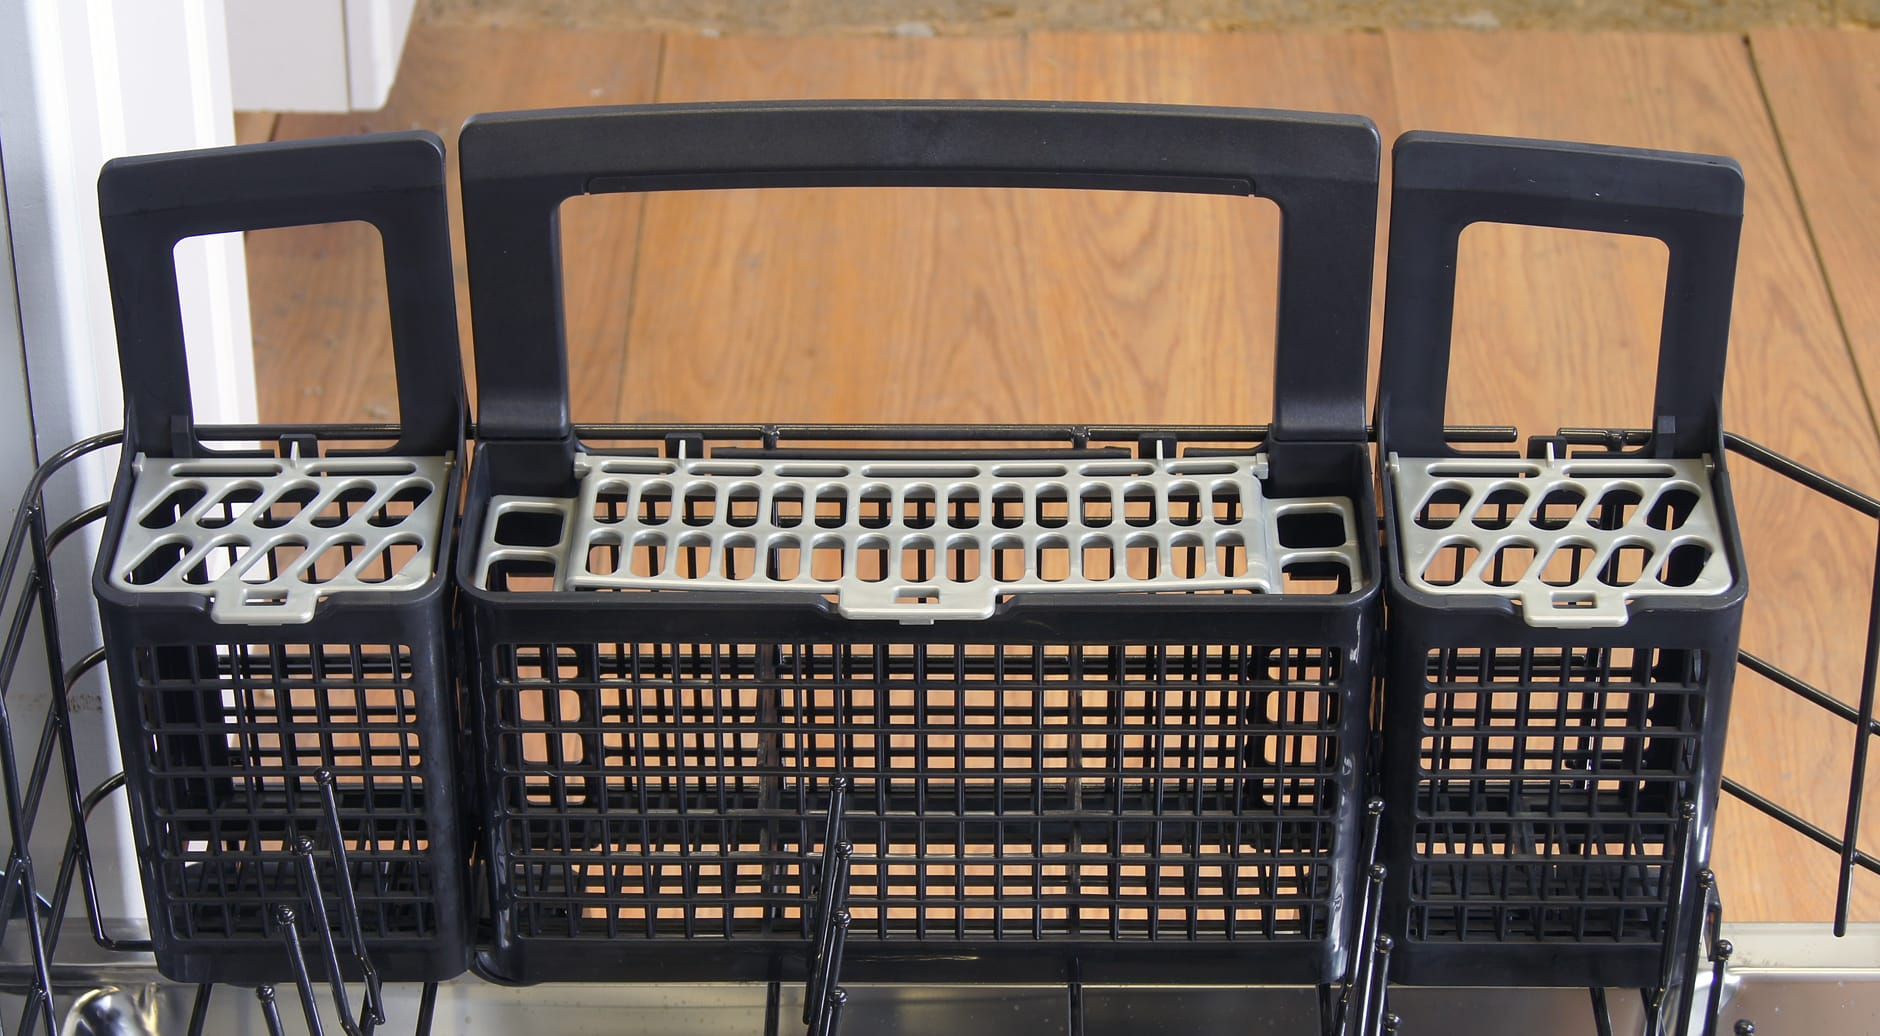 GE Cafe CDT725SSFSS cutlery basket